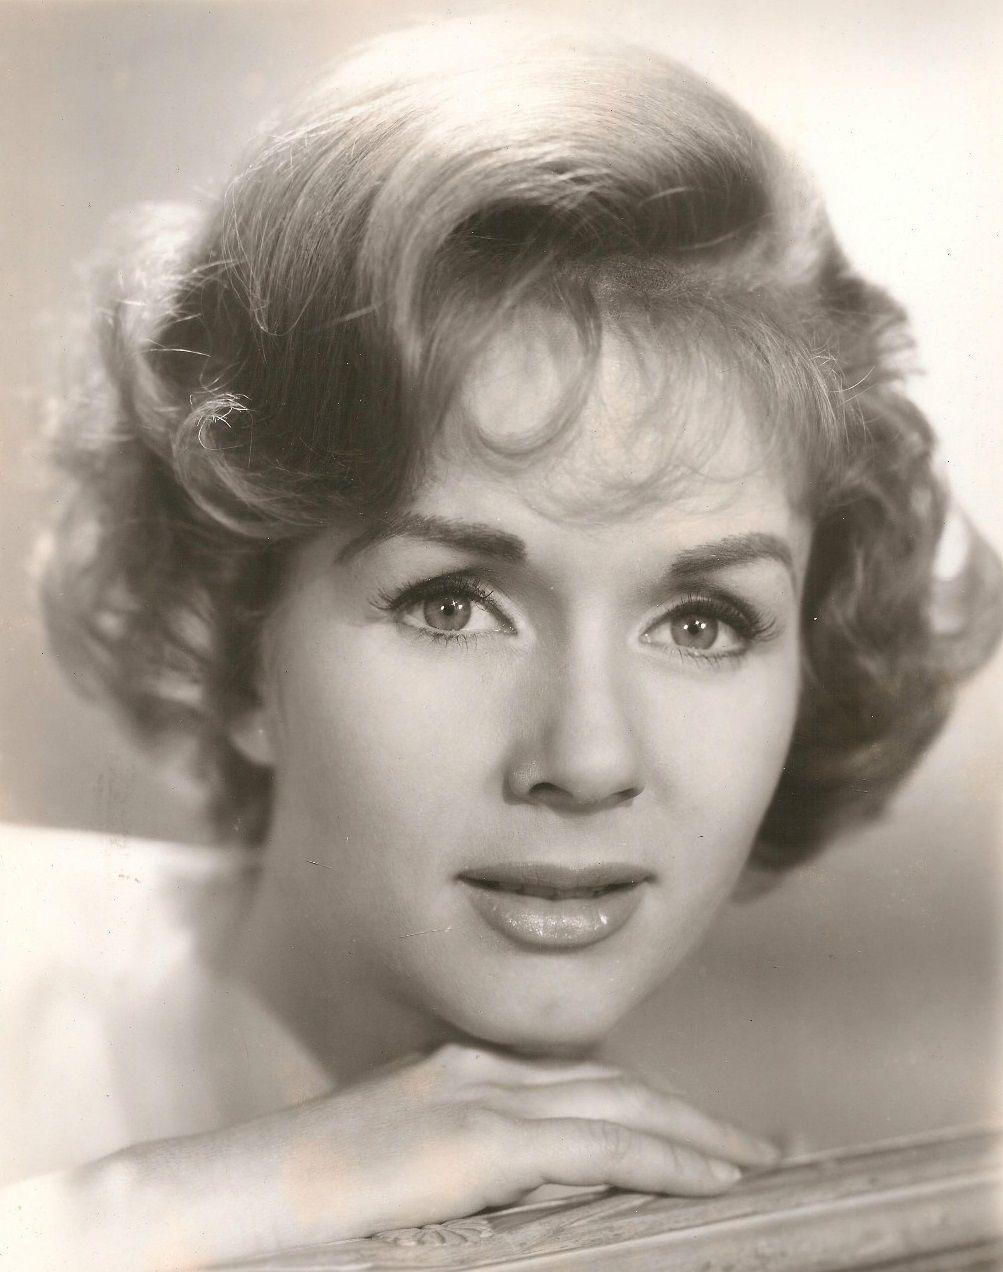 Young Debbie Reynolds Debbie Reynolds | When...